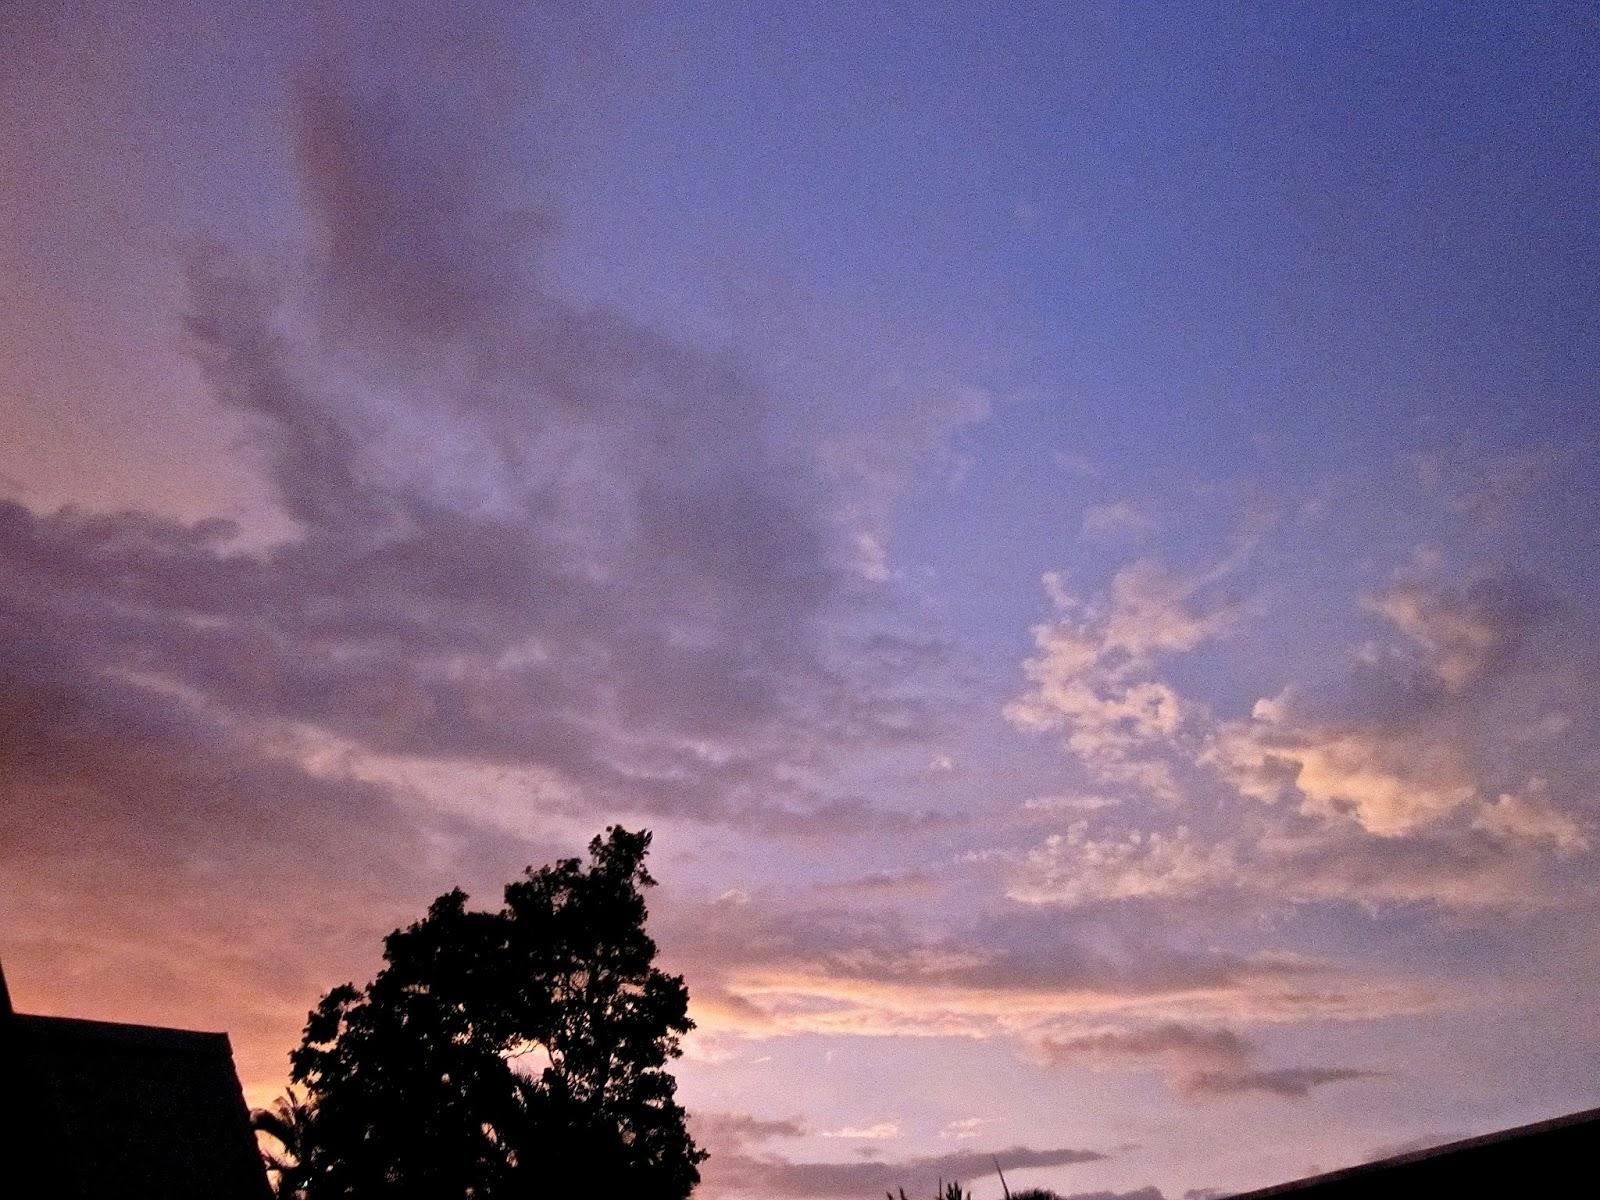 jkwgalleries: Purple Sky/Clouds, Sunrise and noon Clouds